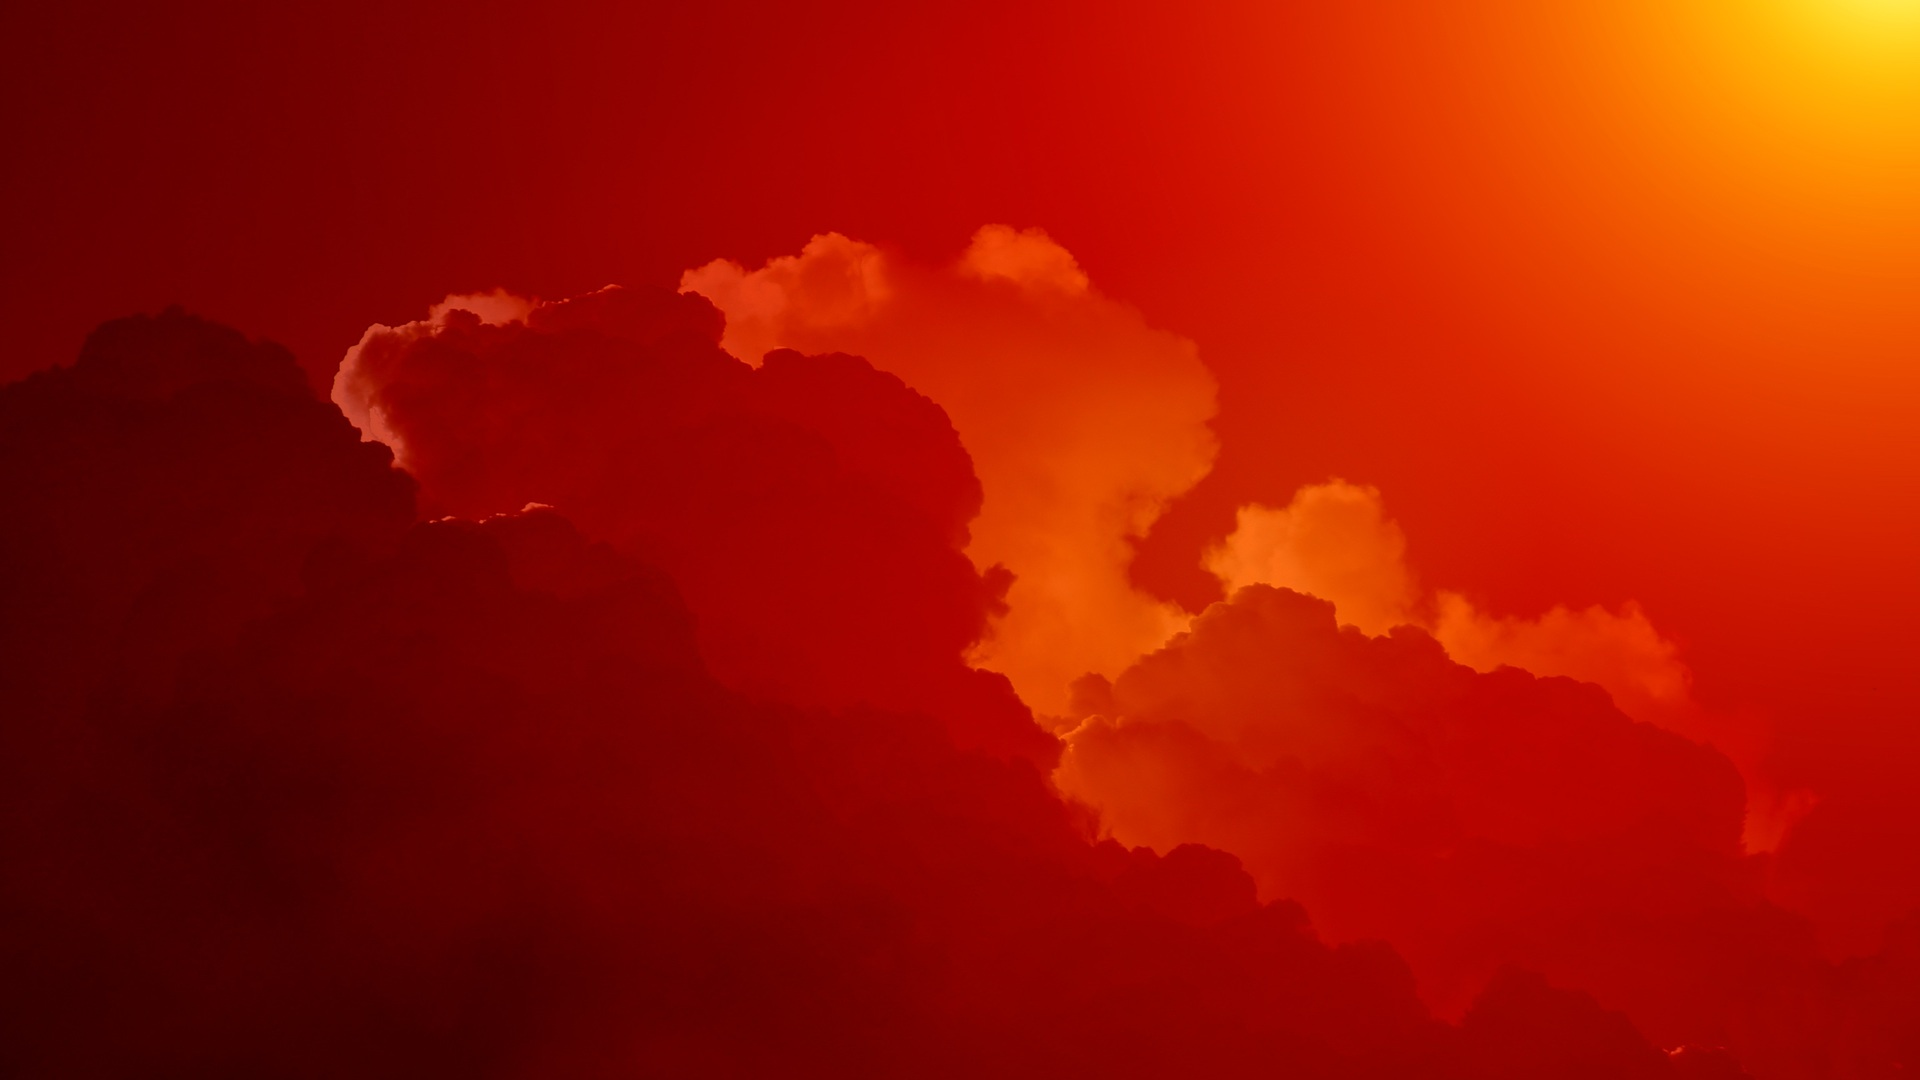 1920x1080 Red Sky Laptop Full HD 1080P HD 4k Wallpapers ...